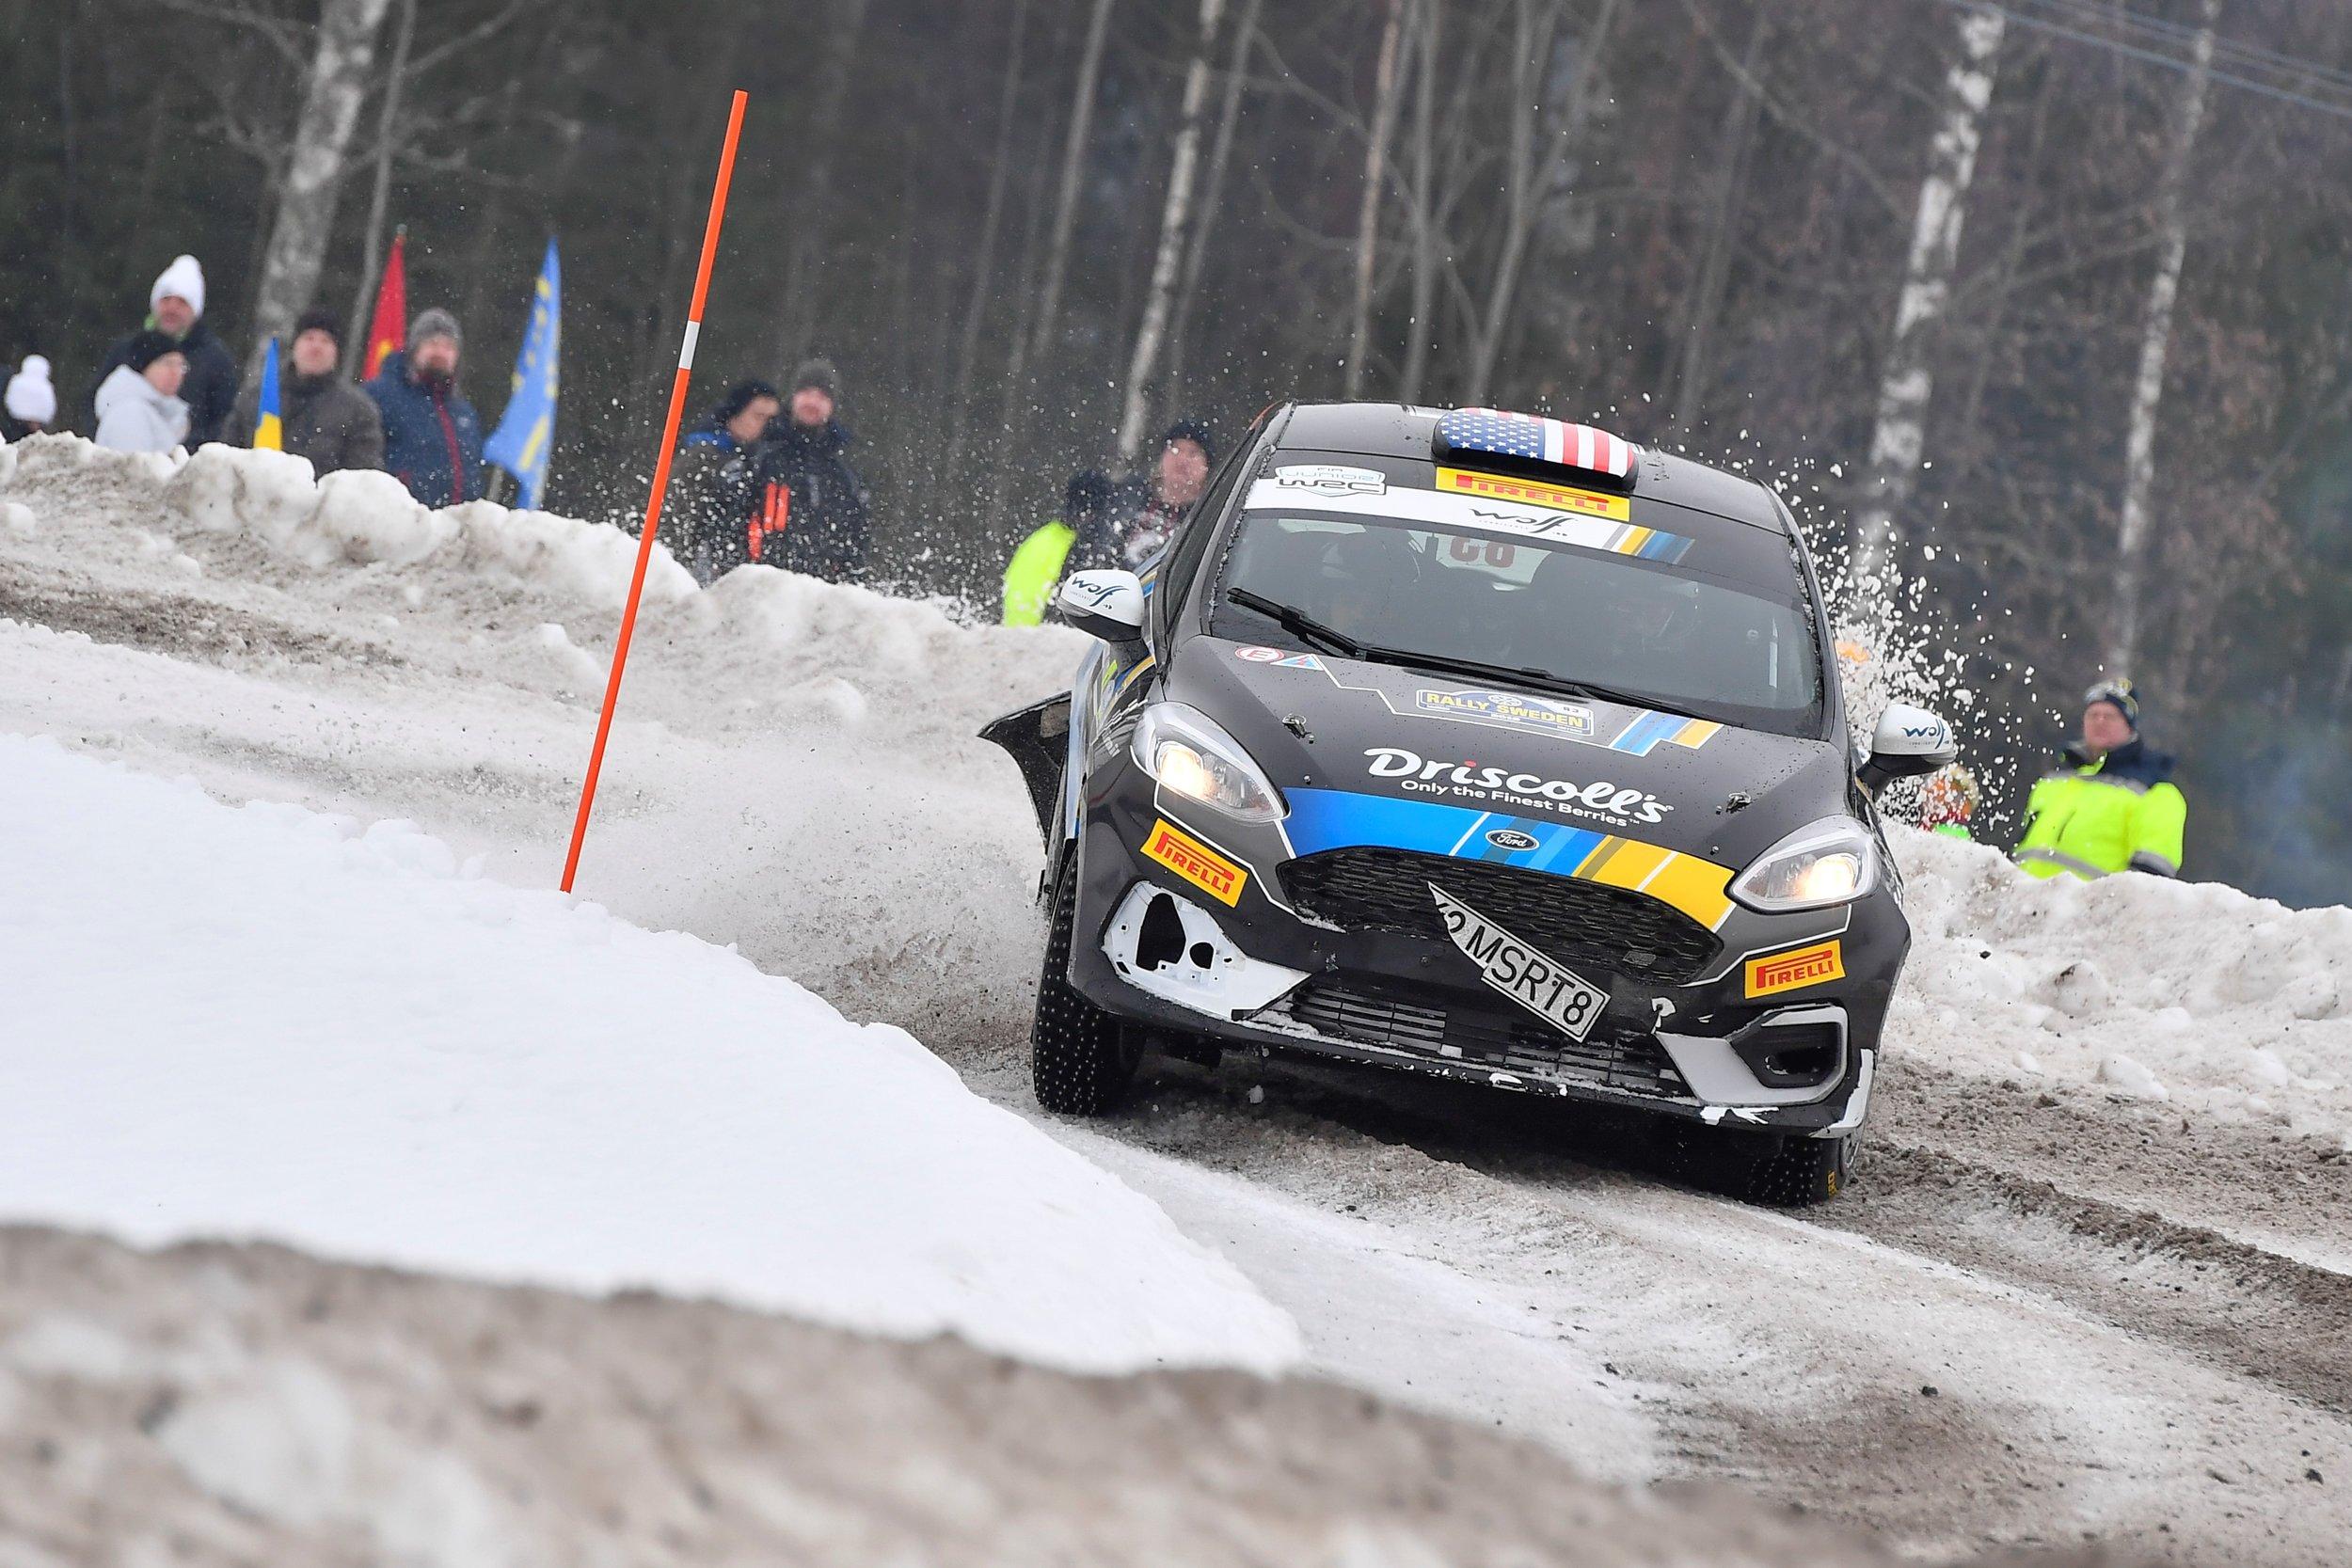 2019_03_19_rallye_sweden_sean_johnston_4.jpg